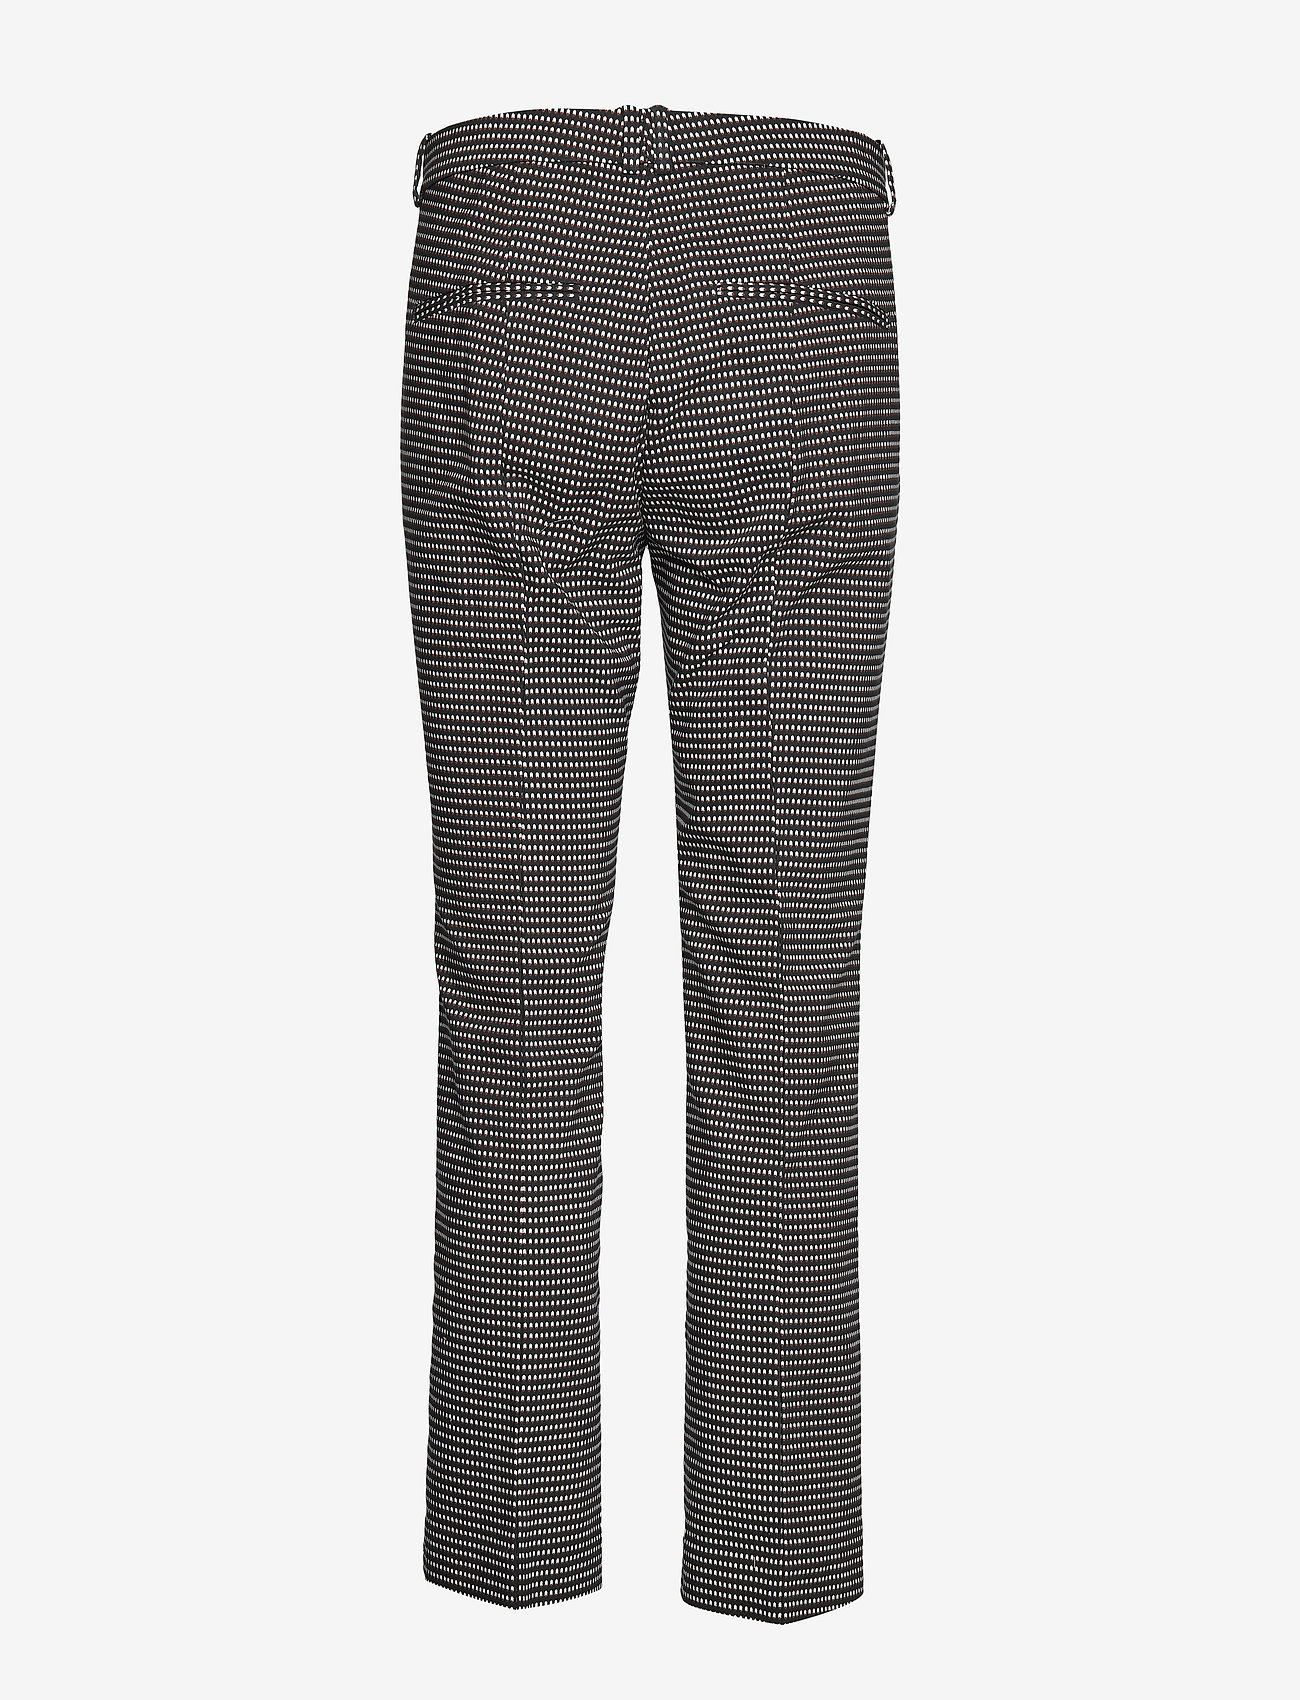 Inwear Zellaiw Kickflare Pant - Byxor Graphic Dots